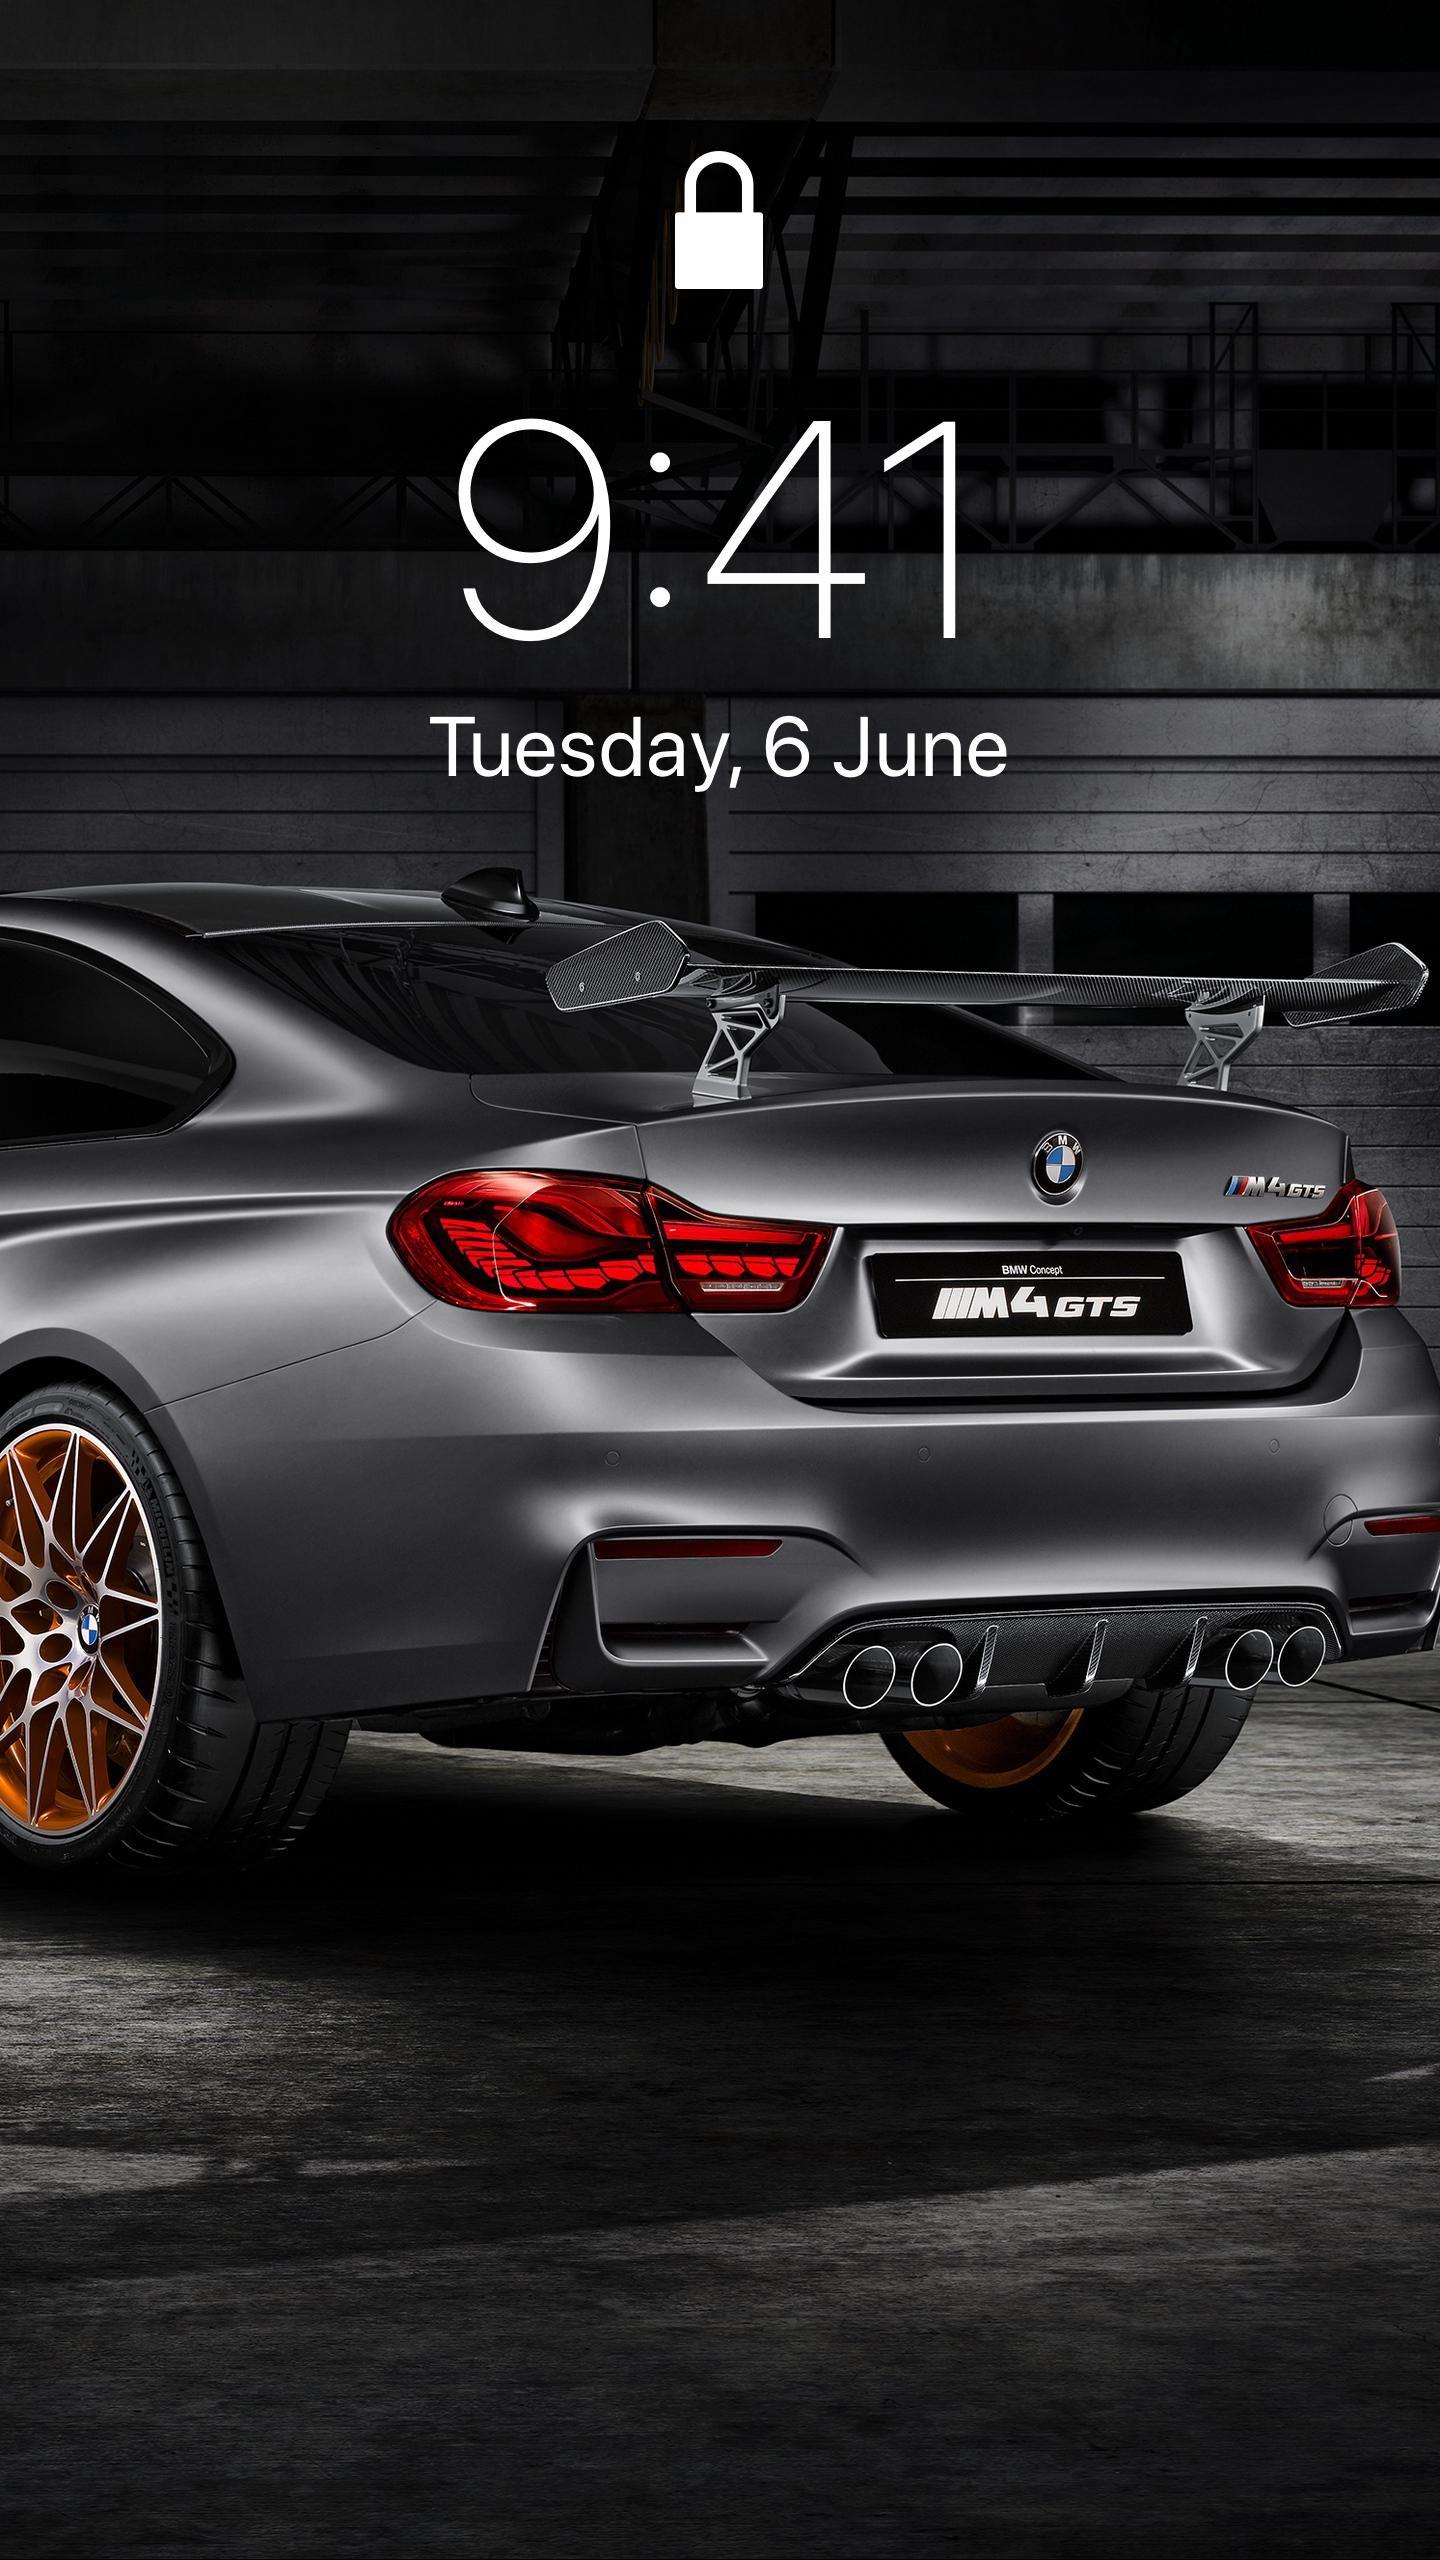 Bmw M4 Gts F82 Silver Rear Background Wallpaper Hd Iphone Ipad M4 Gts Bmw M4 Wallpaper Backgrounds